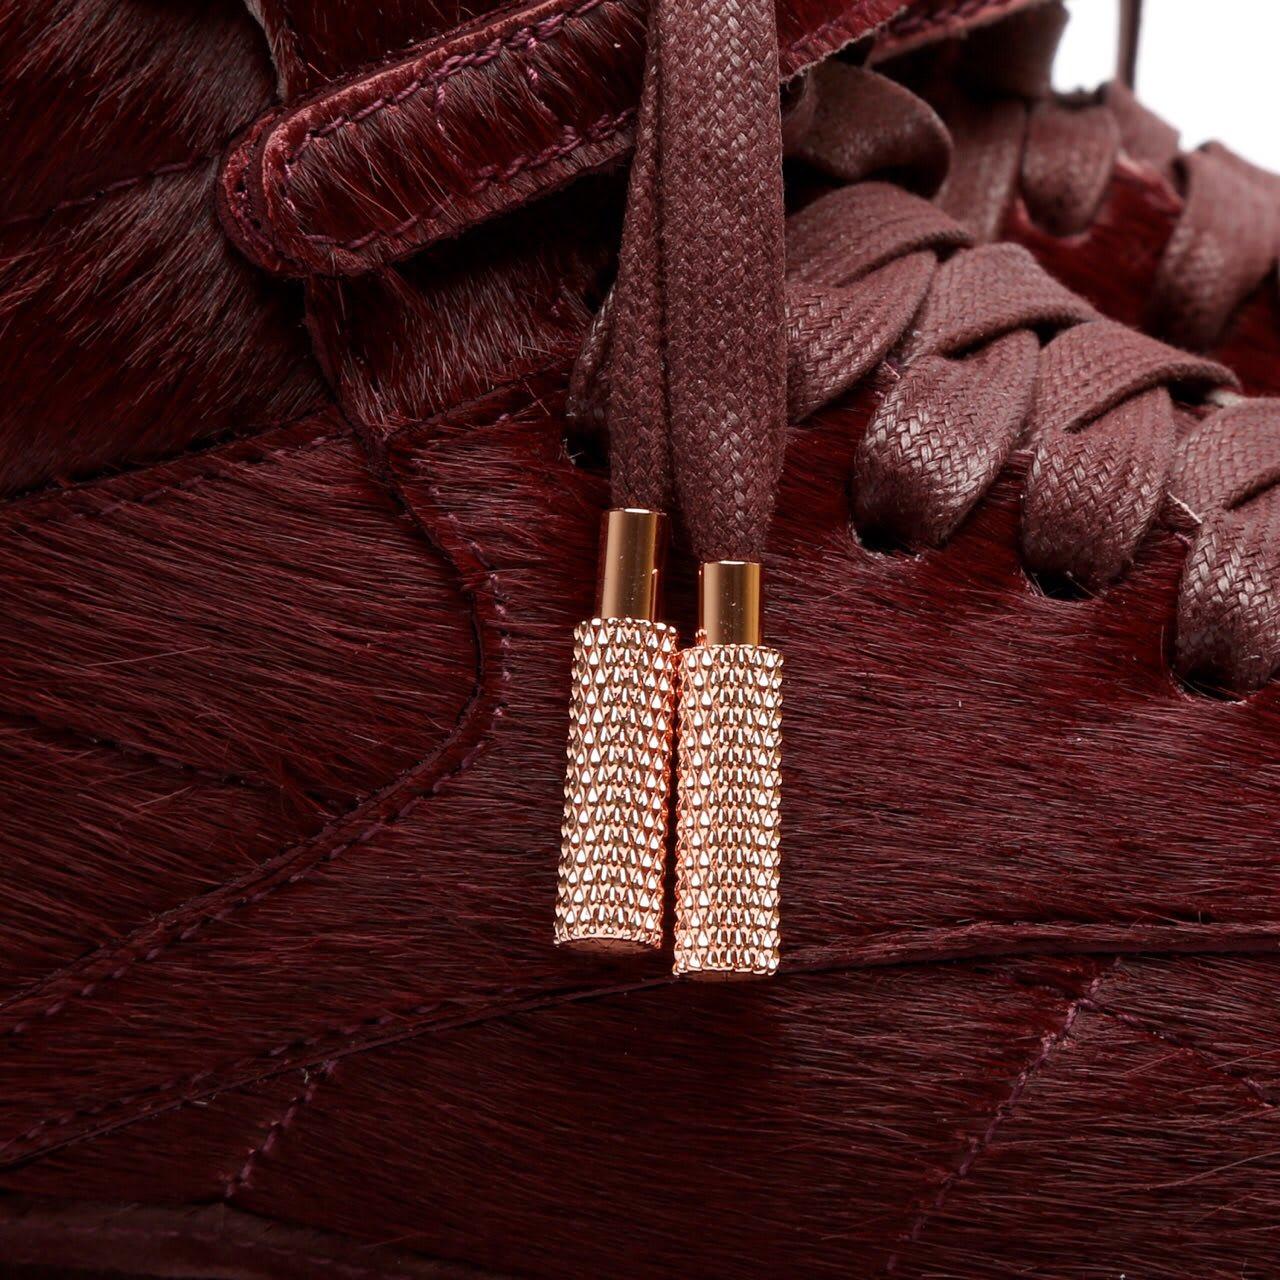 Amber Rose Reebok Muva Fuka Sneakers Lace Tips